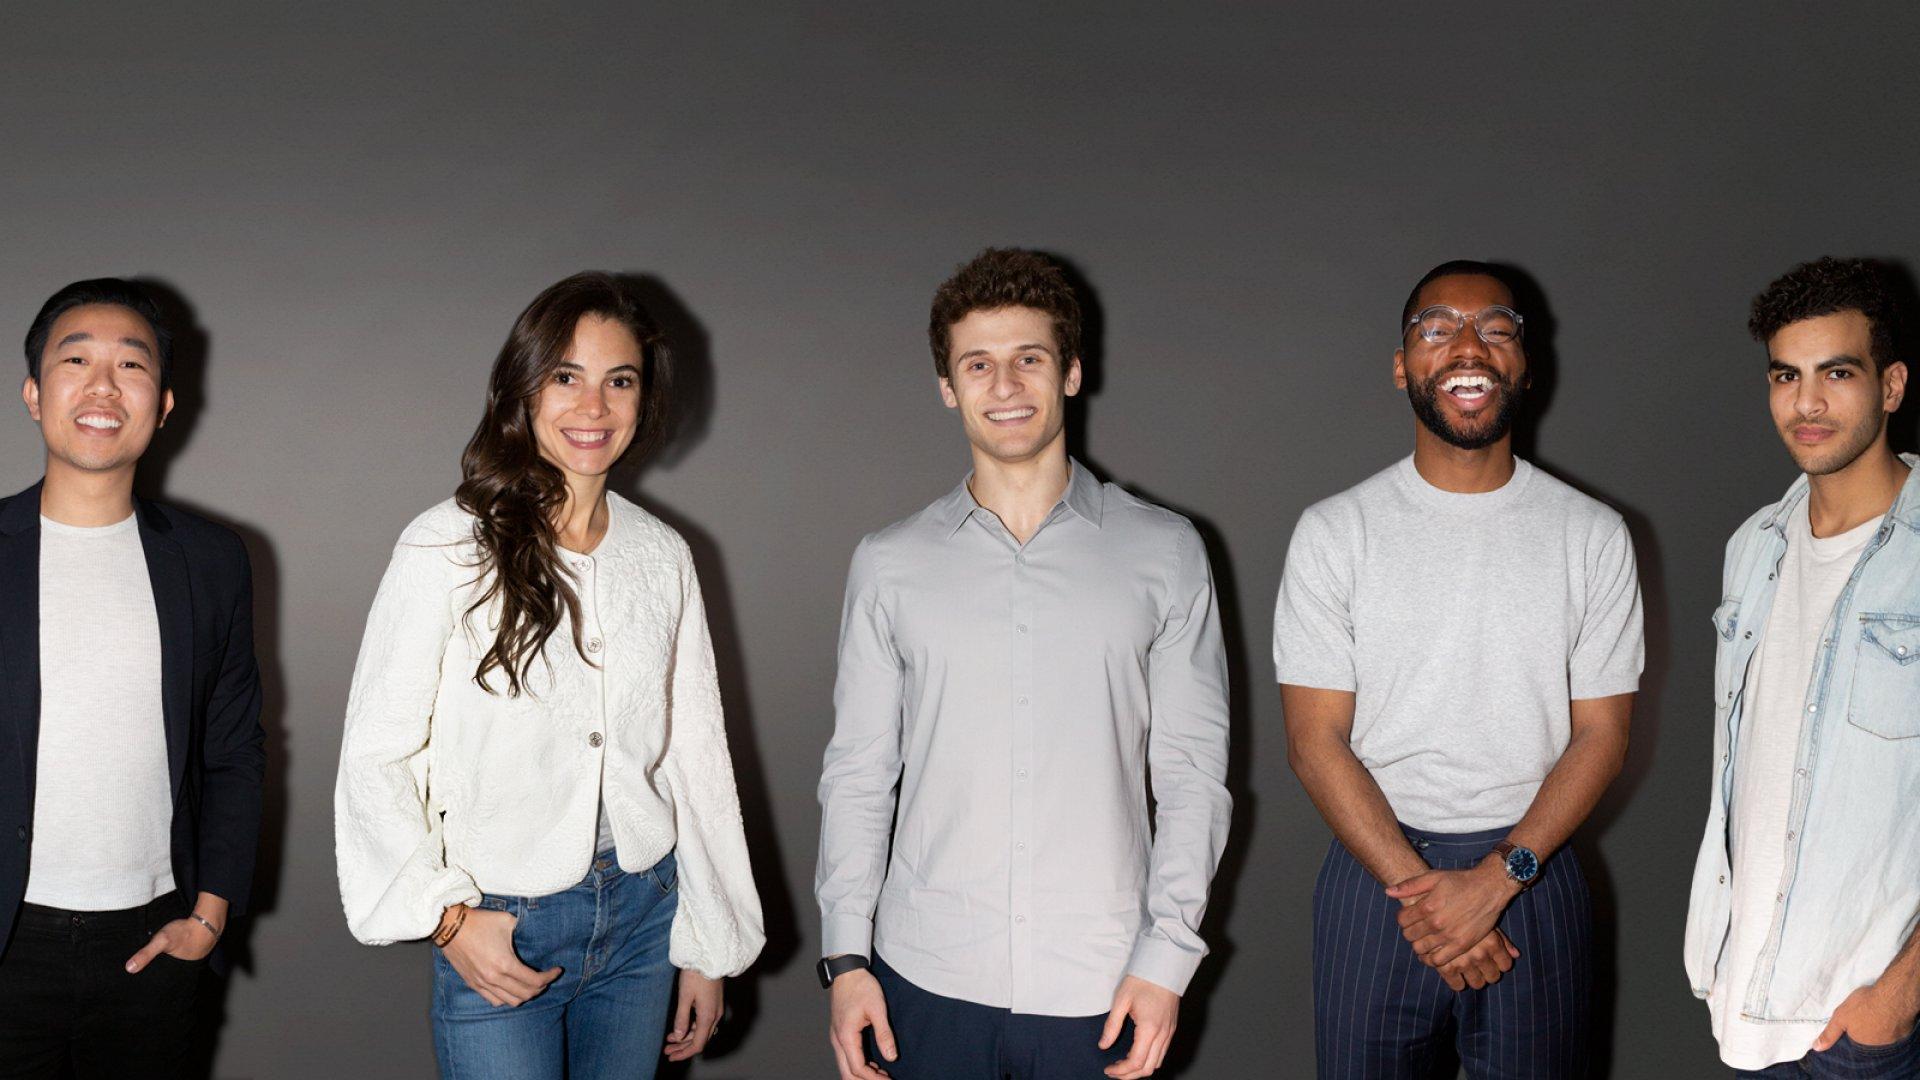 From left: Joseph Quan, Twine; Tiana Tenet, The Culinistas; Zachariah Reitano, Ro; Brandon Bryant, Harlem Capital Partners; Ahmed Beshry, Caper